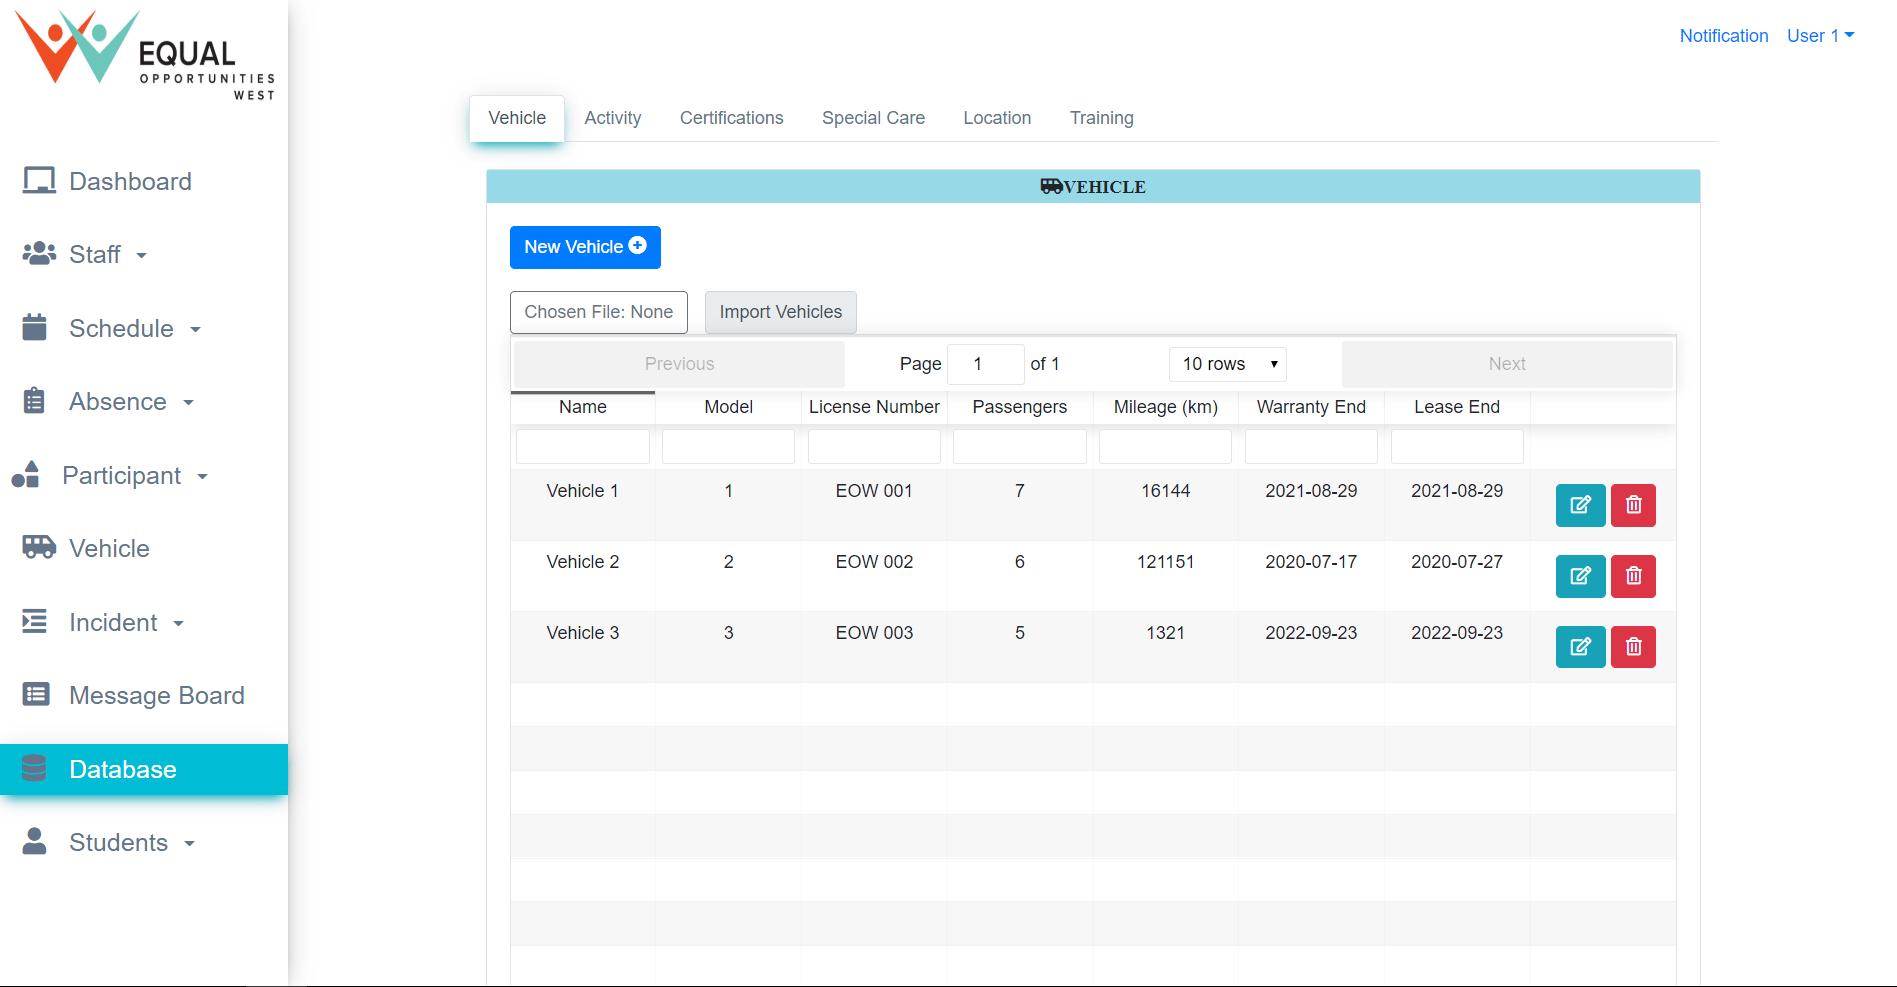 Asset Page